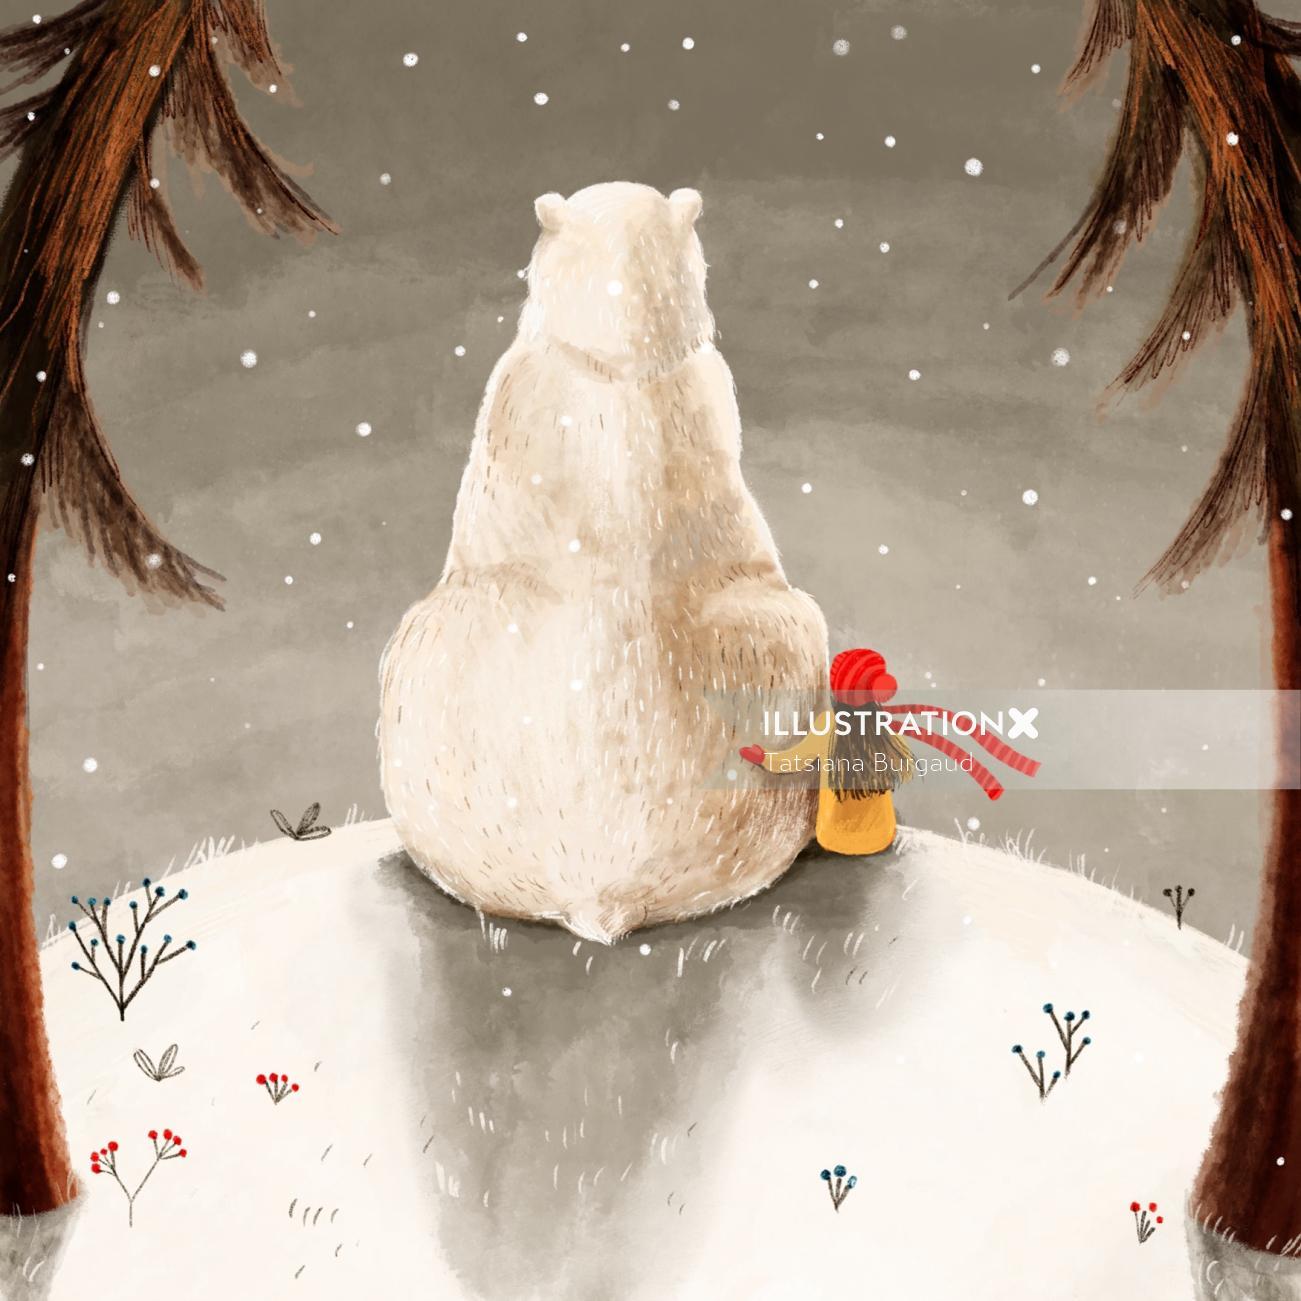 bear, winter, forest, girl, friend